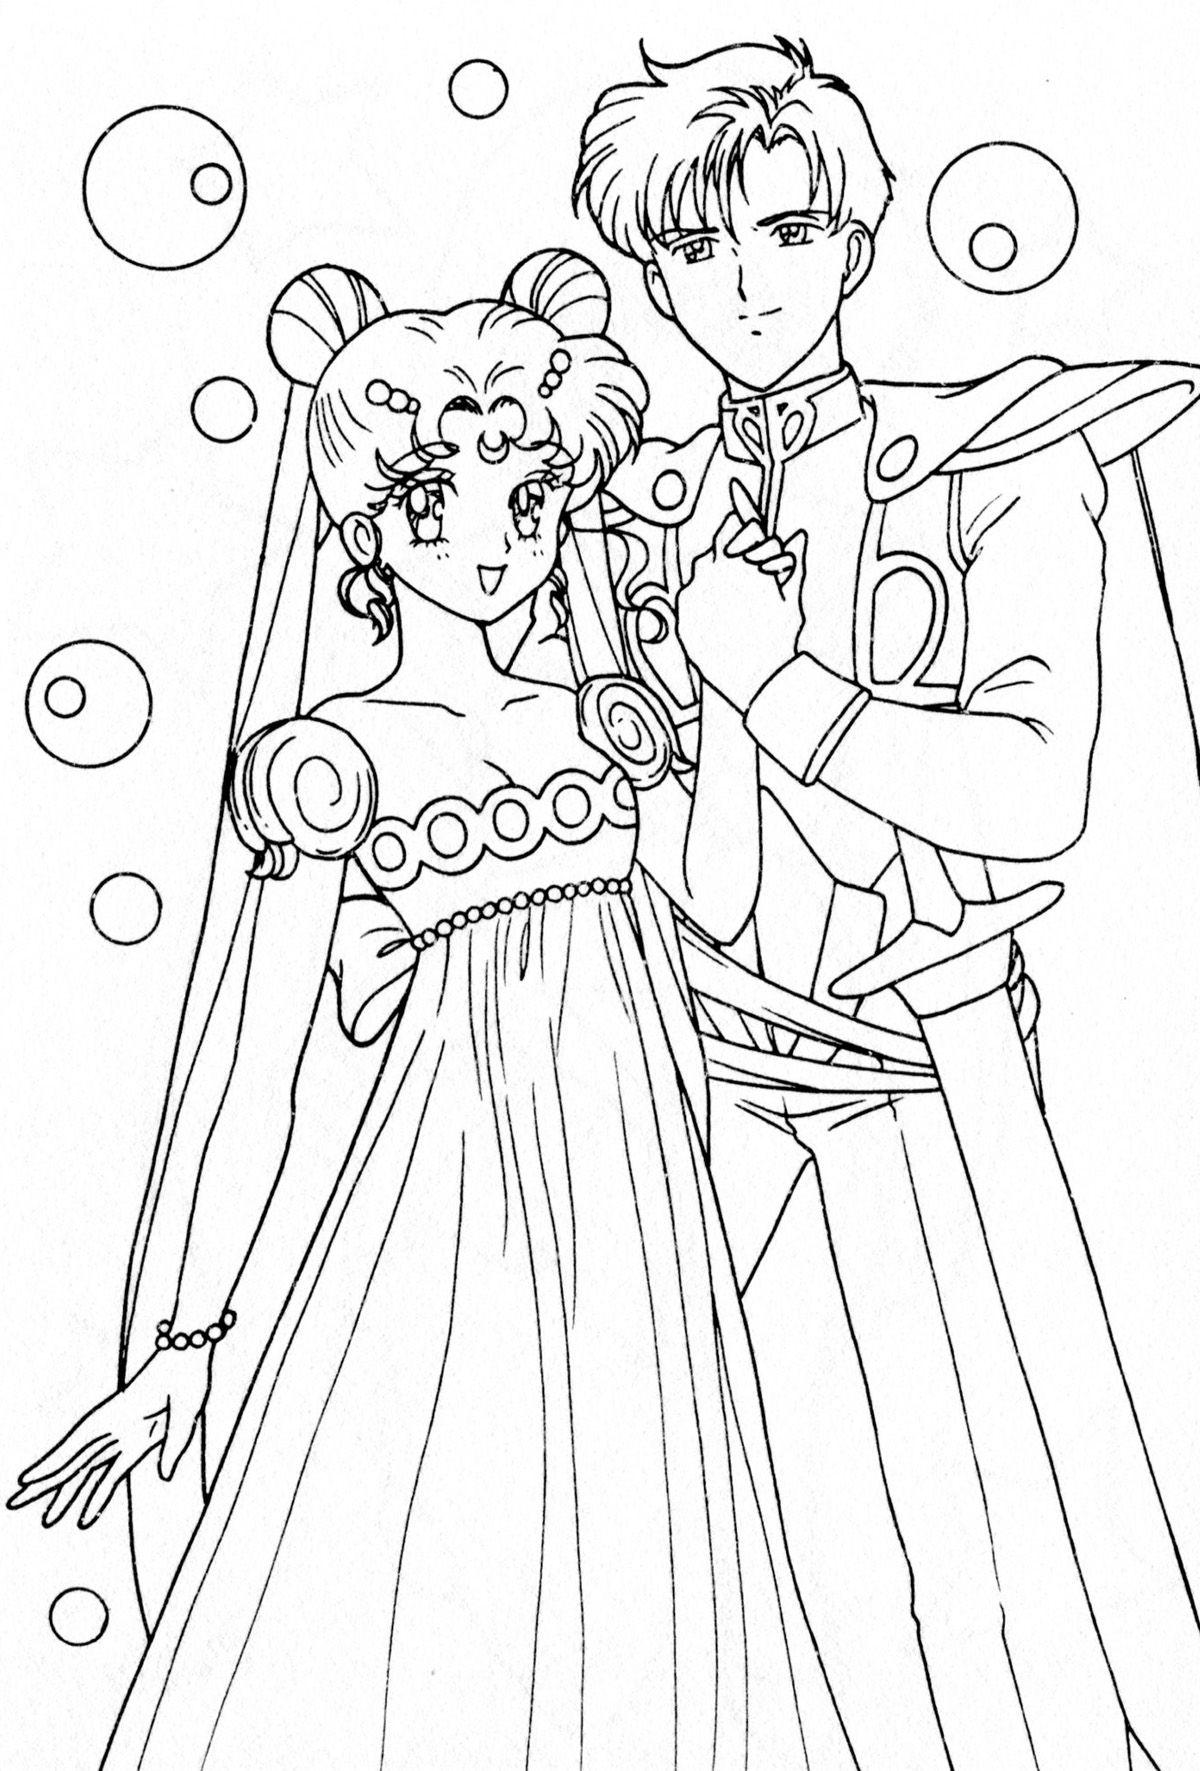 Princess Serenity And Prince Endymion Coloring Page Sailormoon Sailor Moon Coloring Pages Moon Coloring Pages Coloring Books